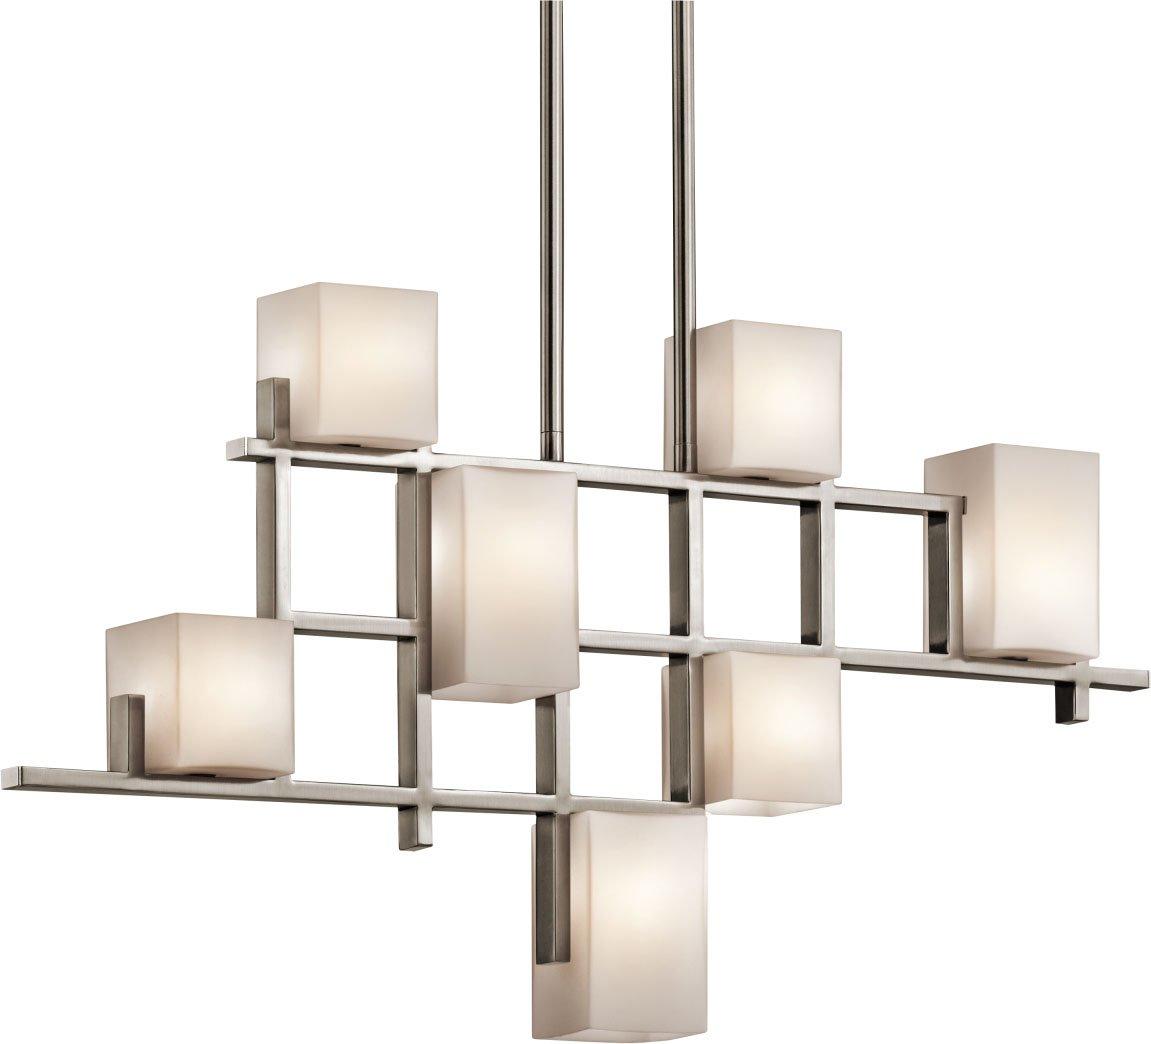 simple chandelier lighting. Simple Chandelier Lighting G